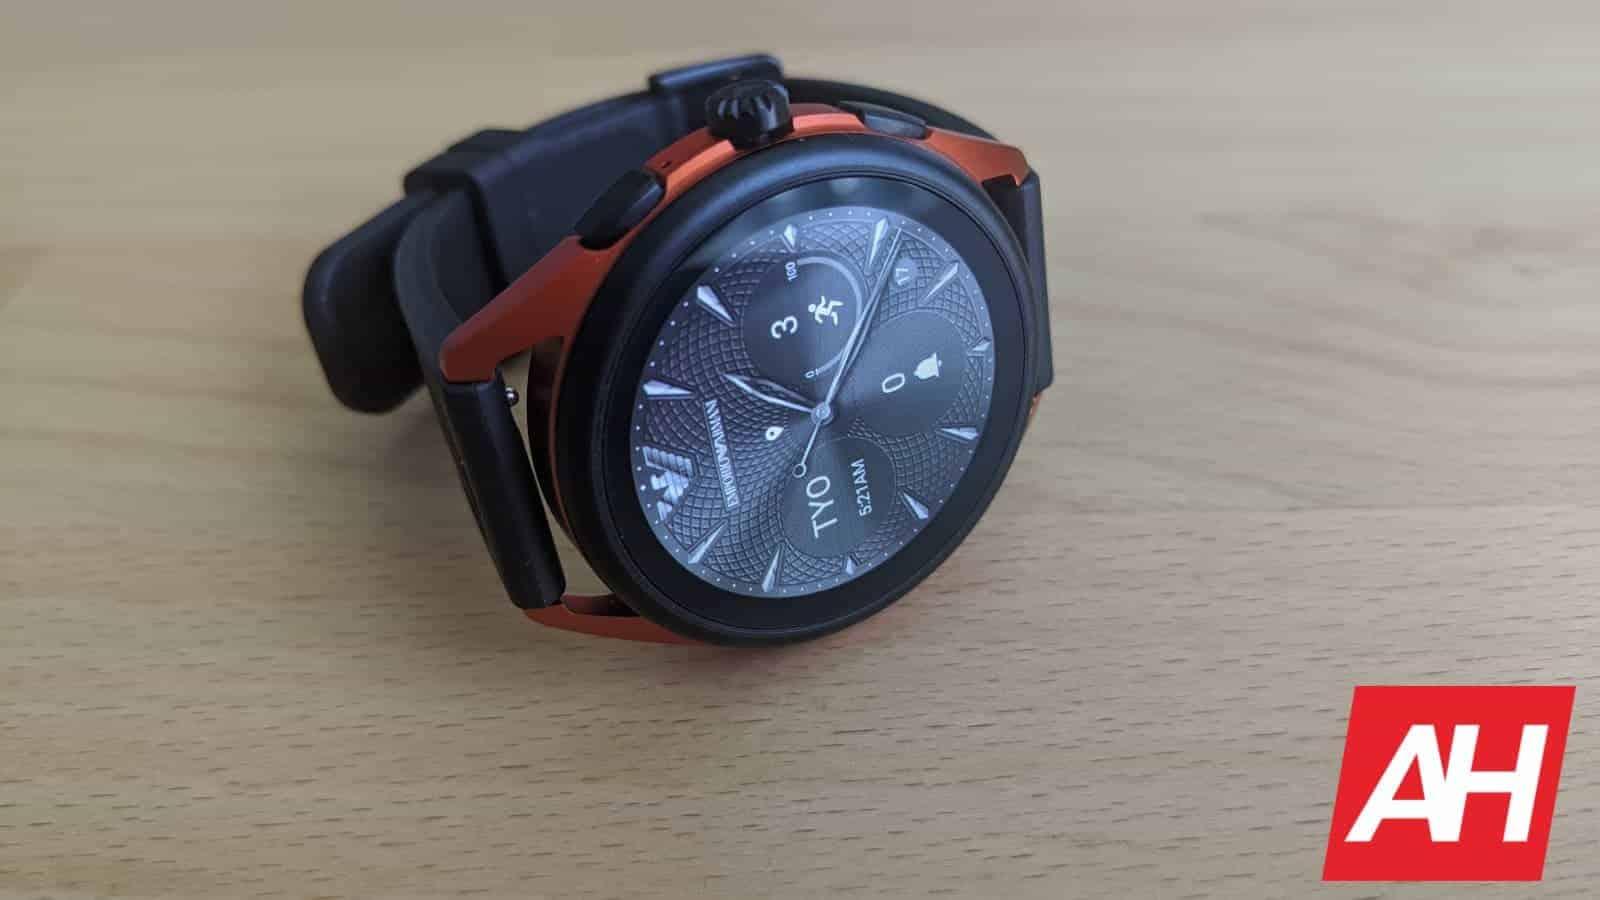 Emporio Armani Smartwatch 3 Review 3